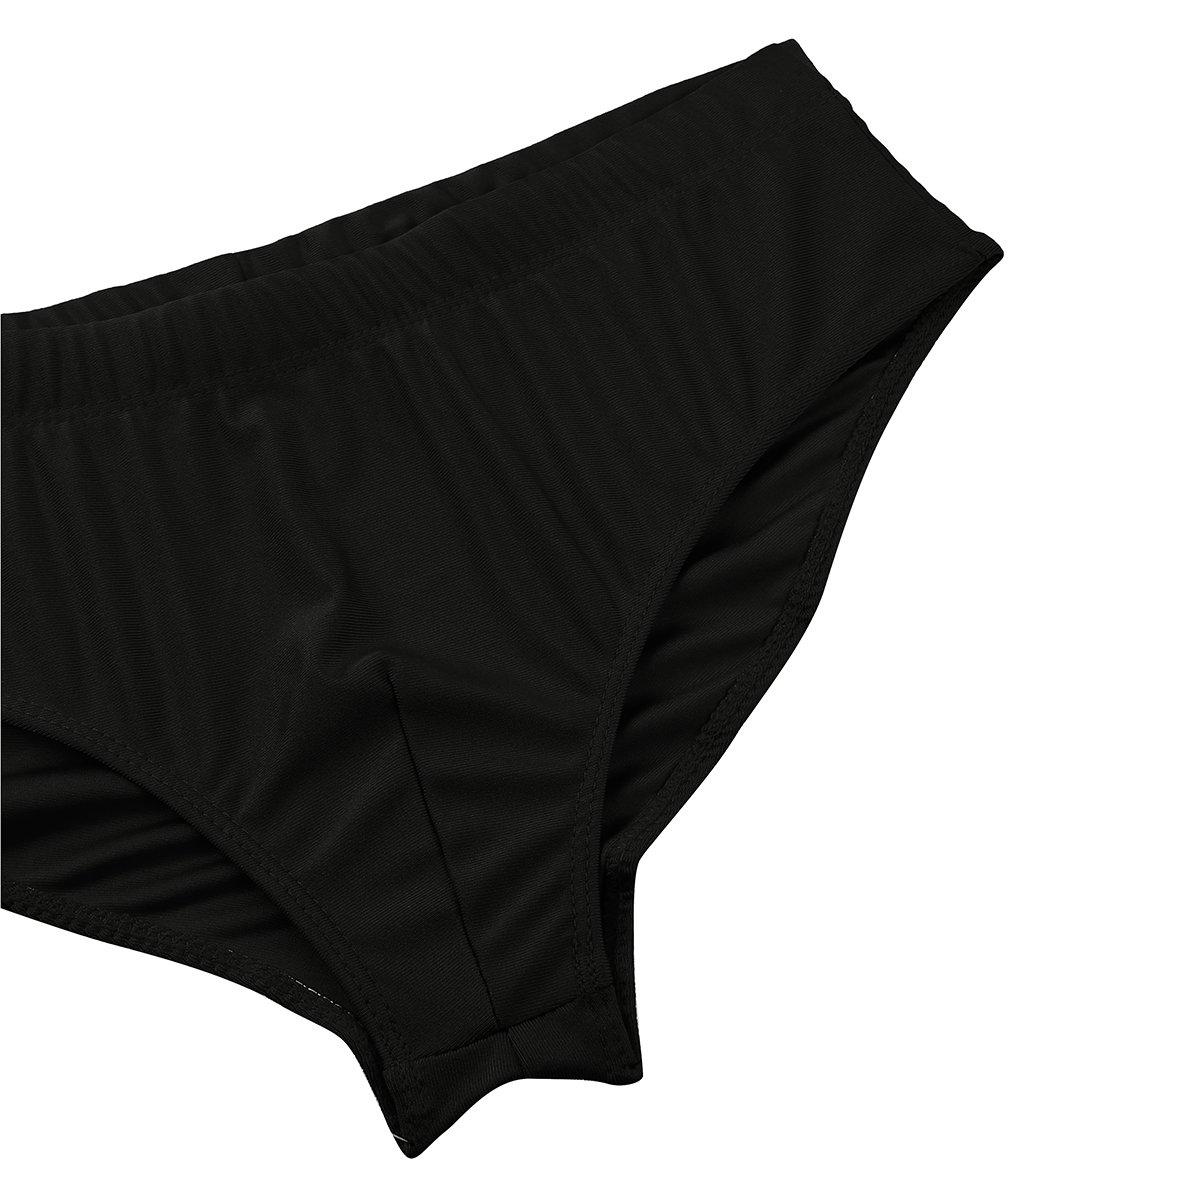 f410910a4 XOXO Womens 26 Inch Knit Pencil Skirt Yellow X-Large XOXO Juniors  Sportswear 6777DLY1 Juniors